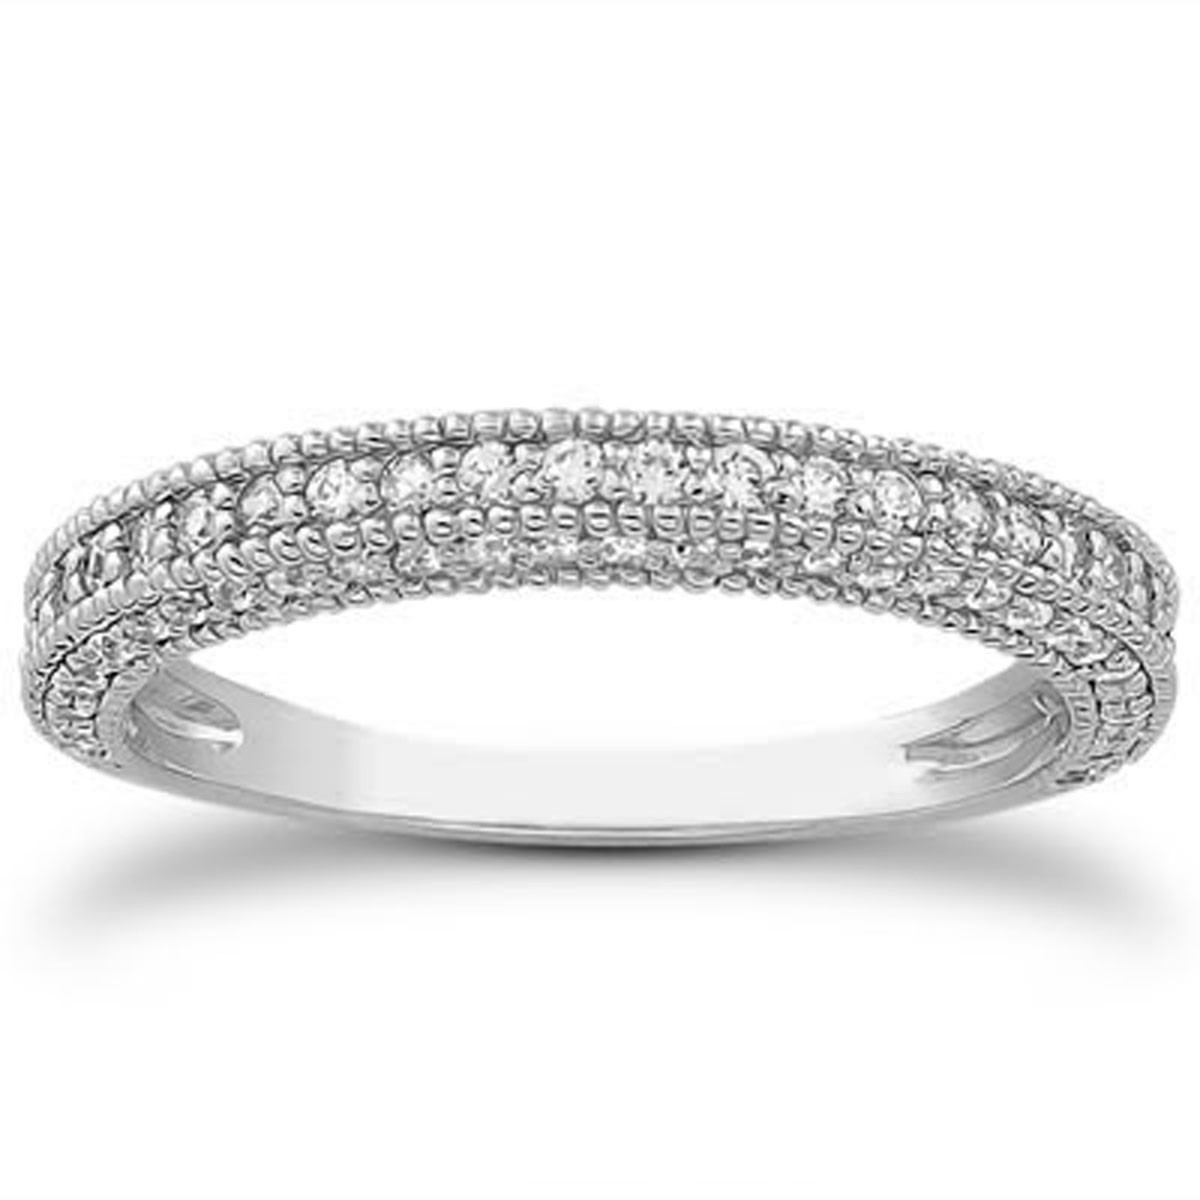 fancy pave milgrain wedding ring band in 14k white